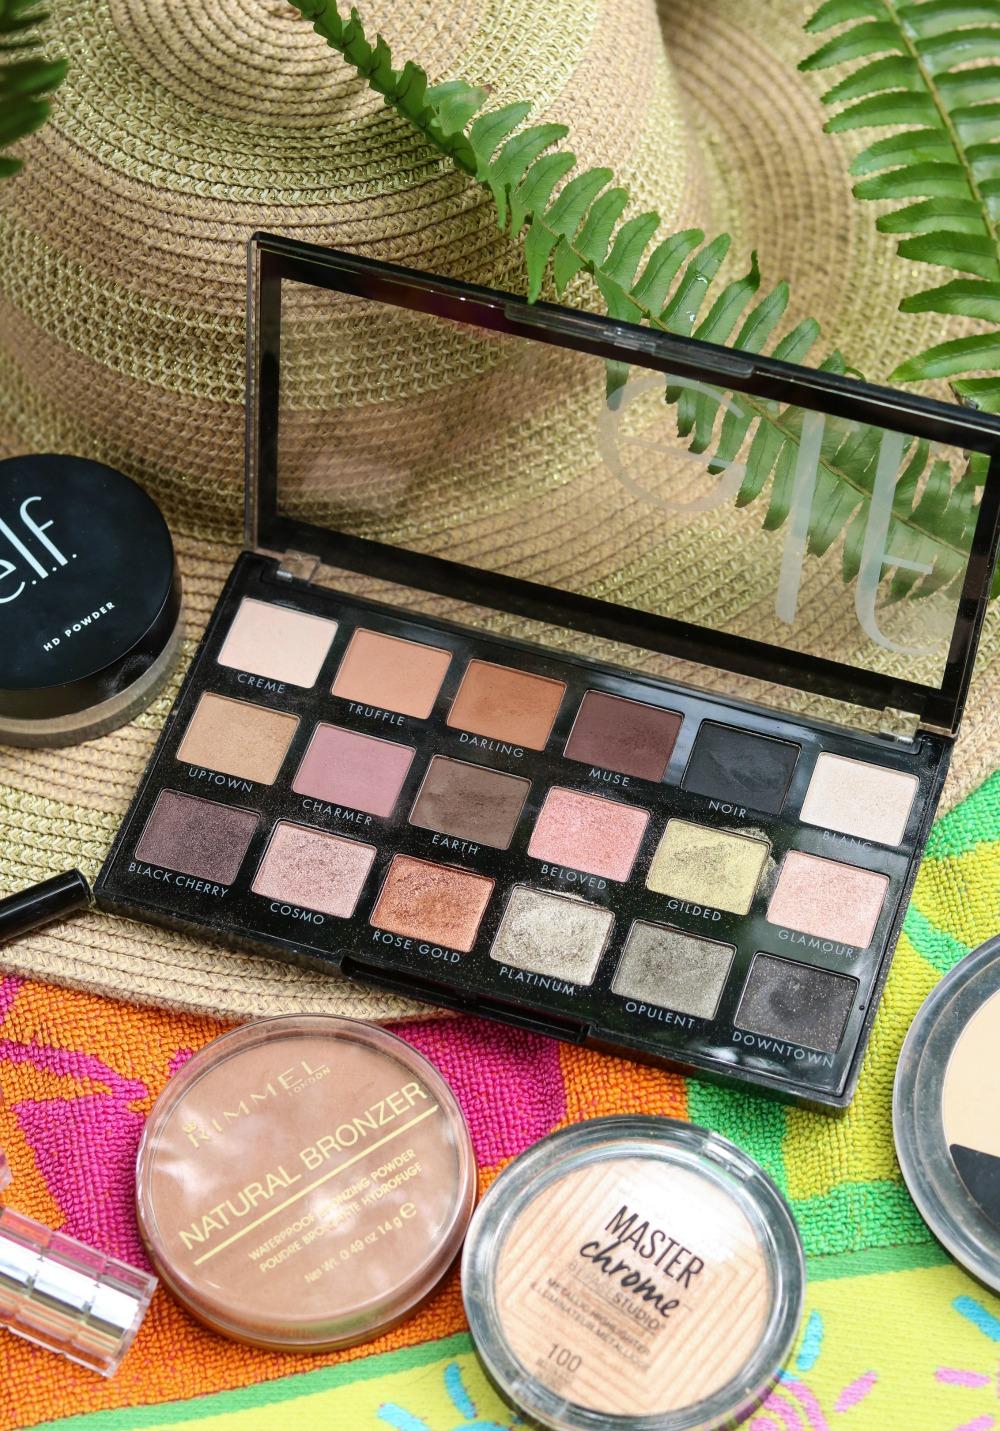 Summer Drugstore Makeup Tutorial I ELF New Classics Eyeshadow Palette #summermakeup #makeuptutorial #beautyblogger #makeup